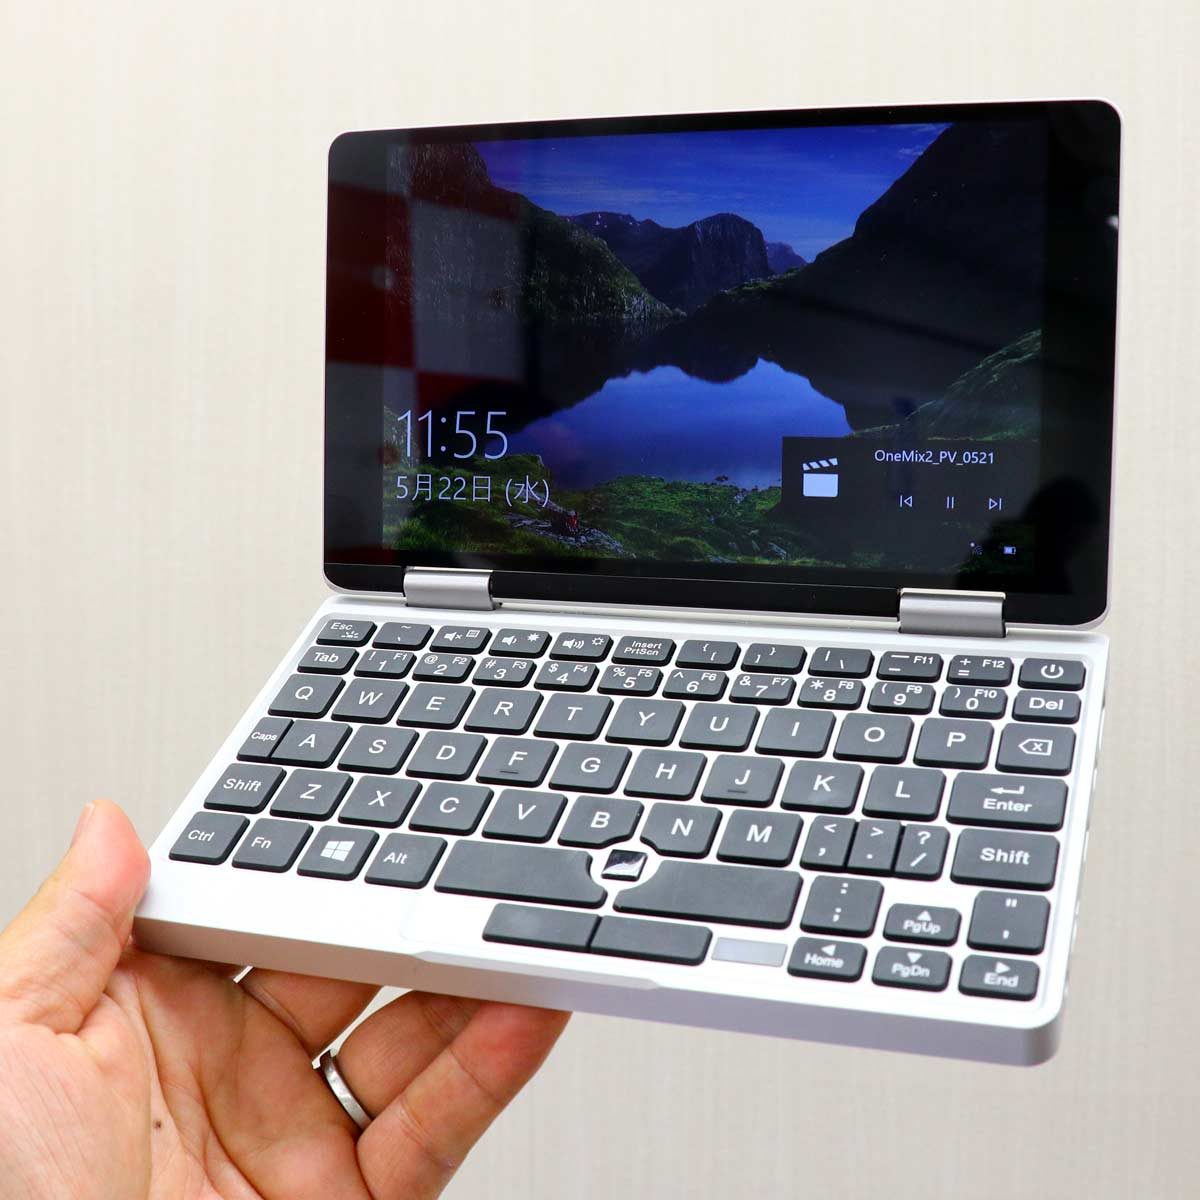 2in1のUMPC「OneMix2S」国内正規版がいよいよ発売! ペン付属で価格は95,000円(税別)